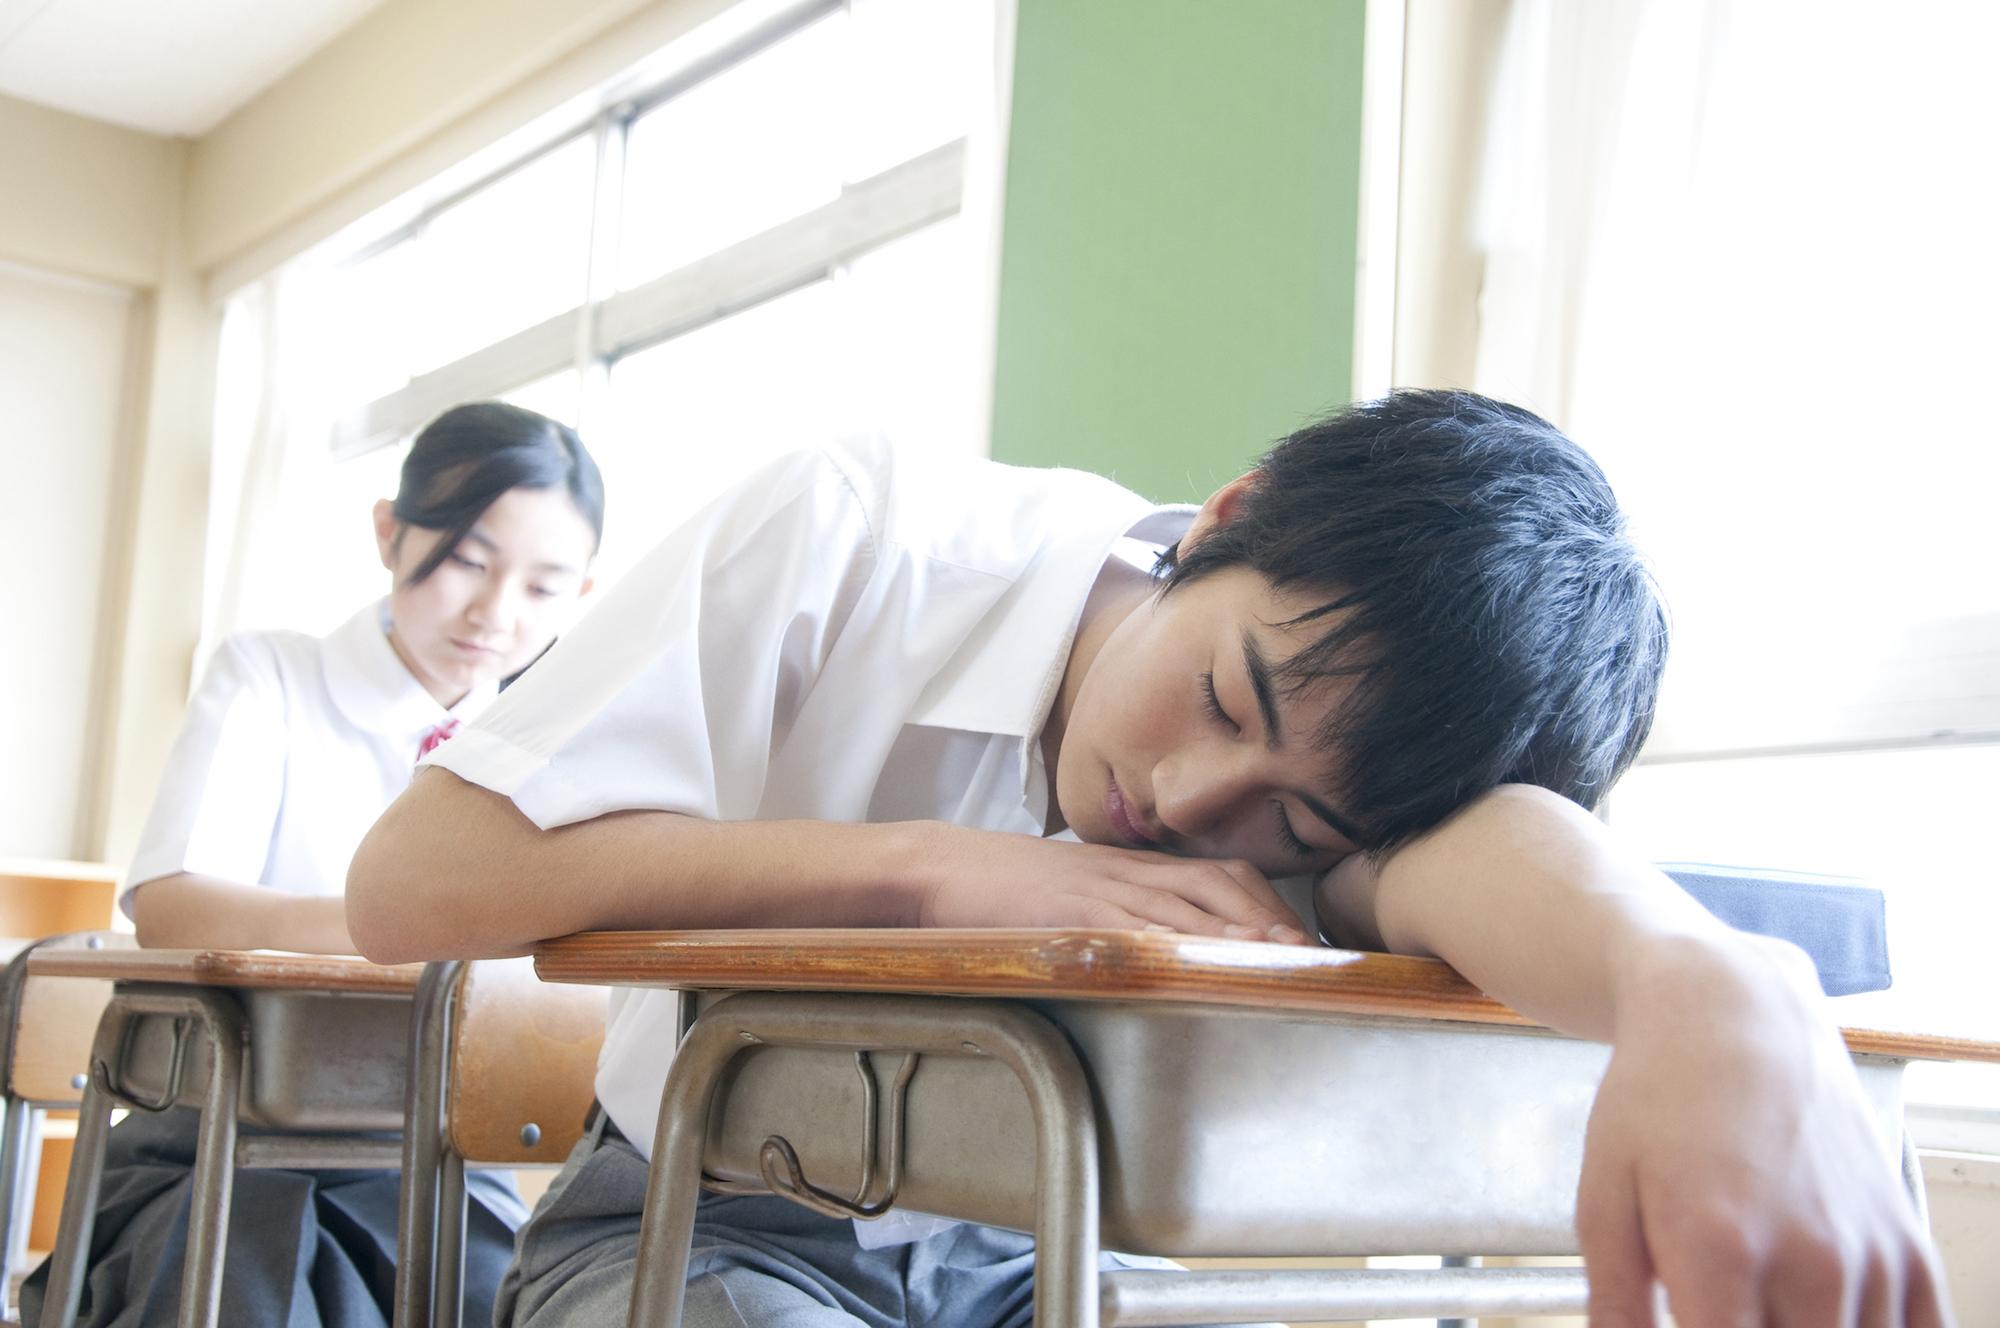 Men's junior high school student falls asleep.